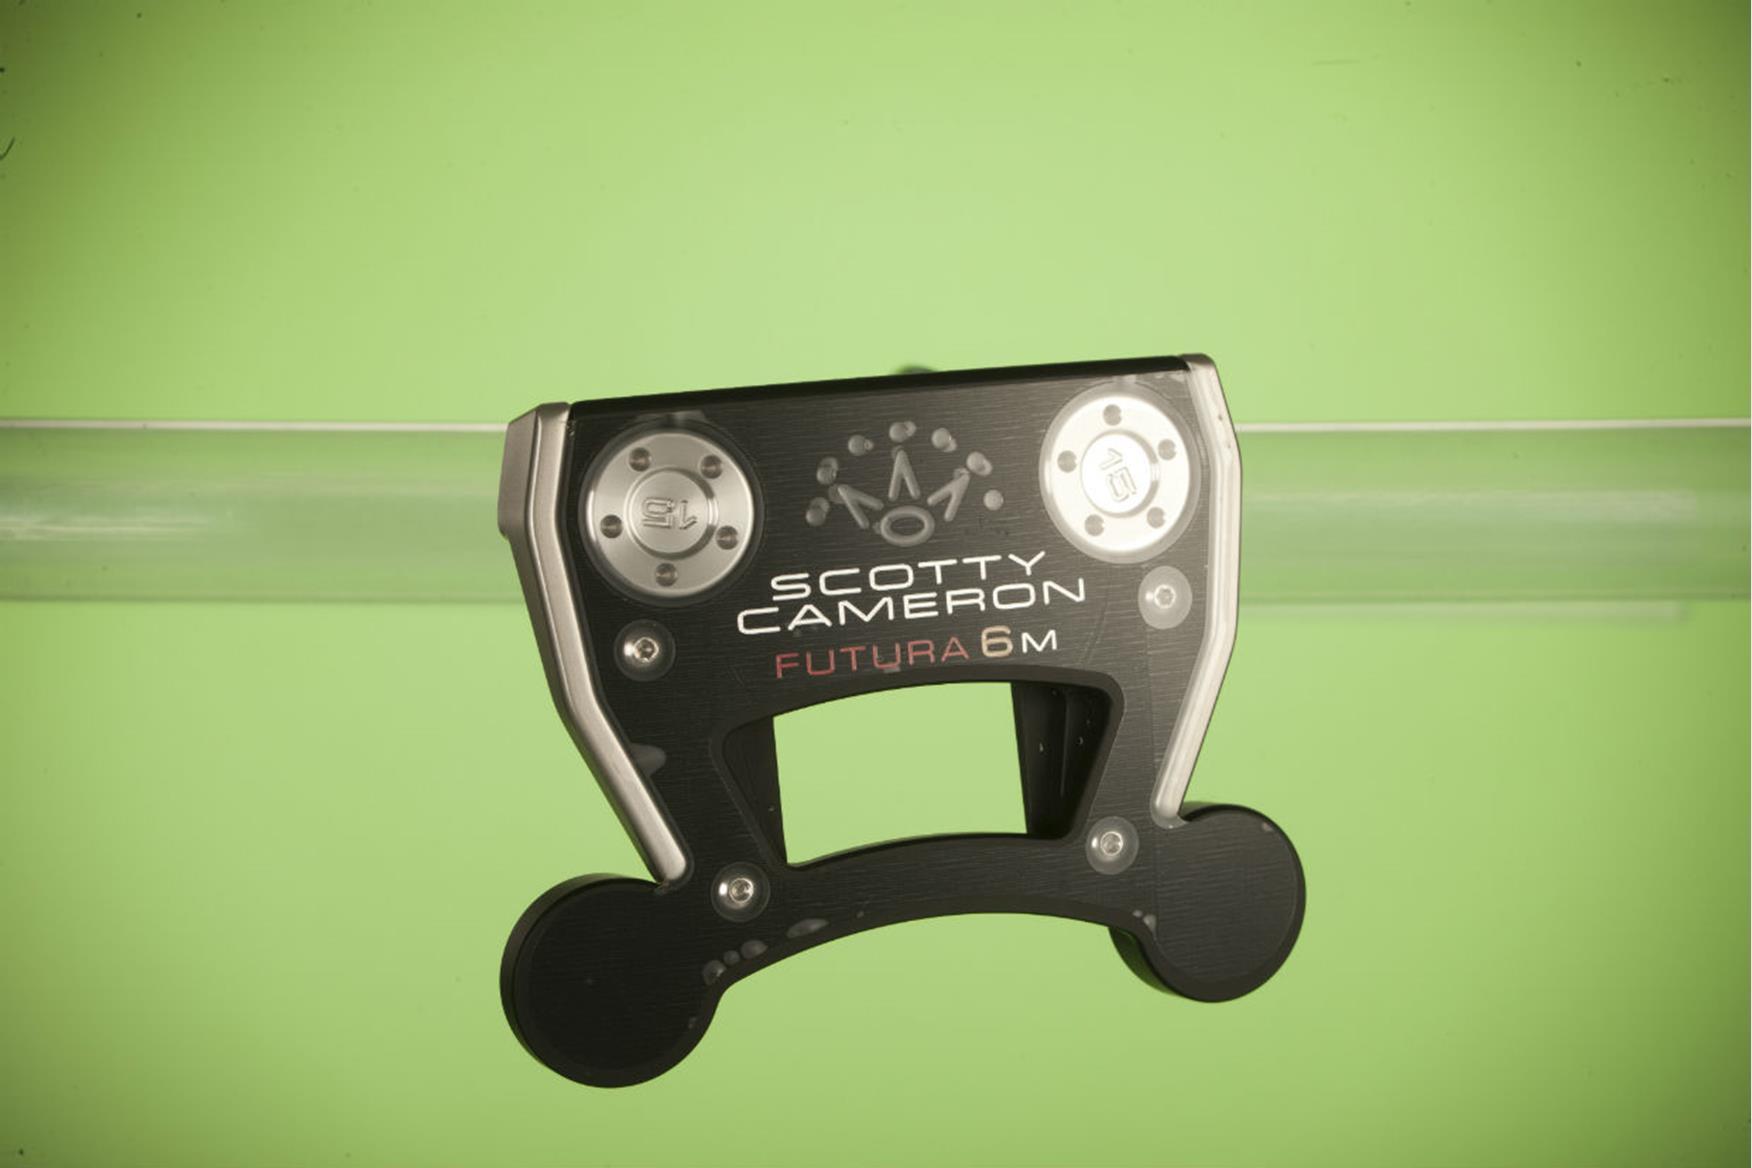 Scotty Cameron Futura 6M Putter Review | Equipment Reviews